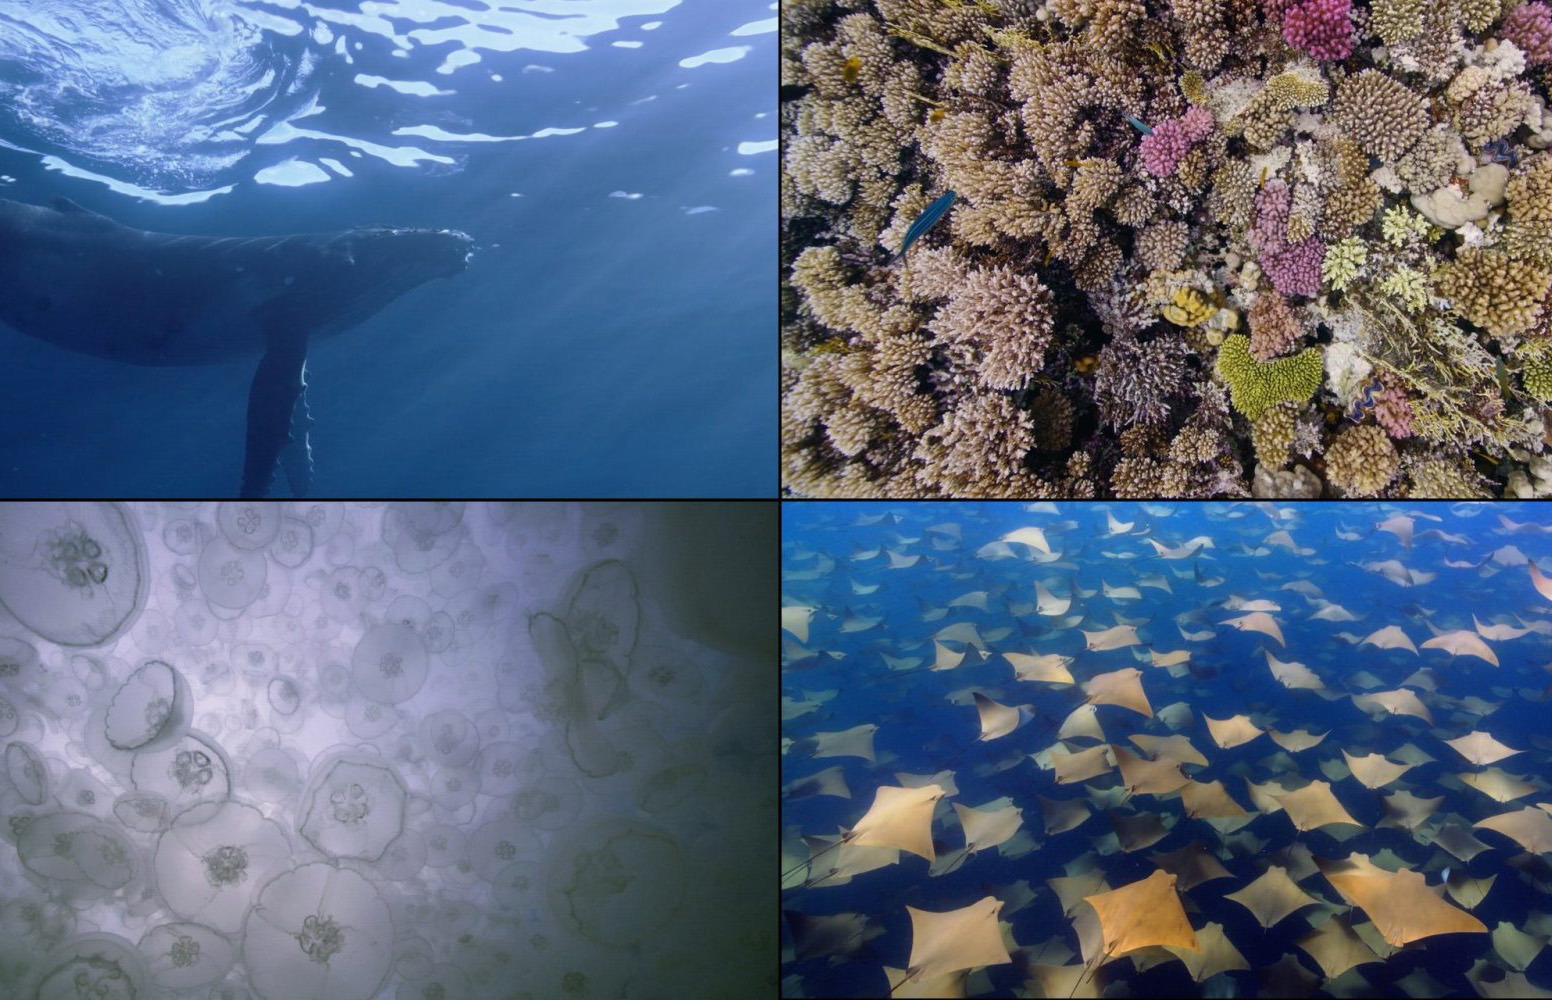 apple-tv-gets-new-underwater-screensavers